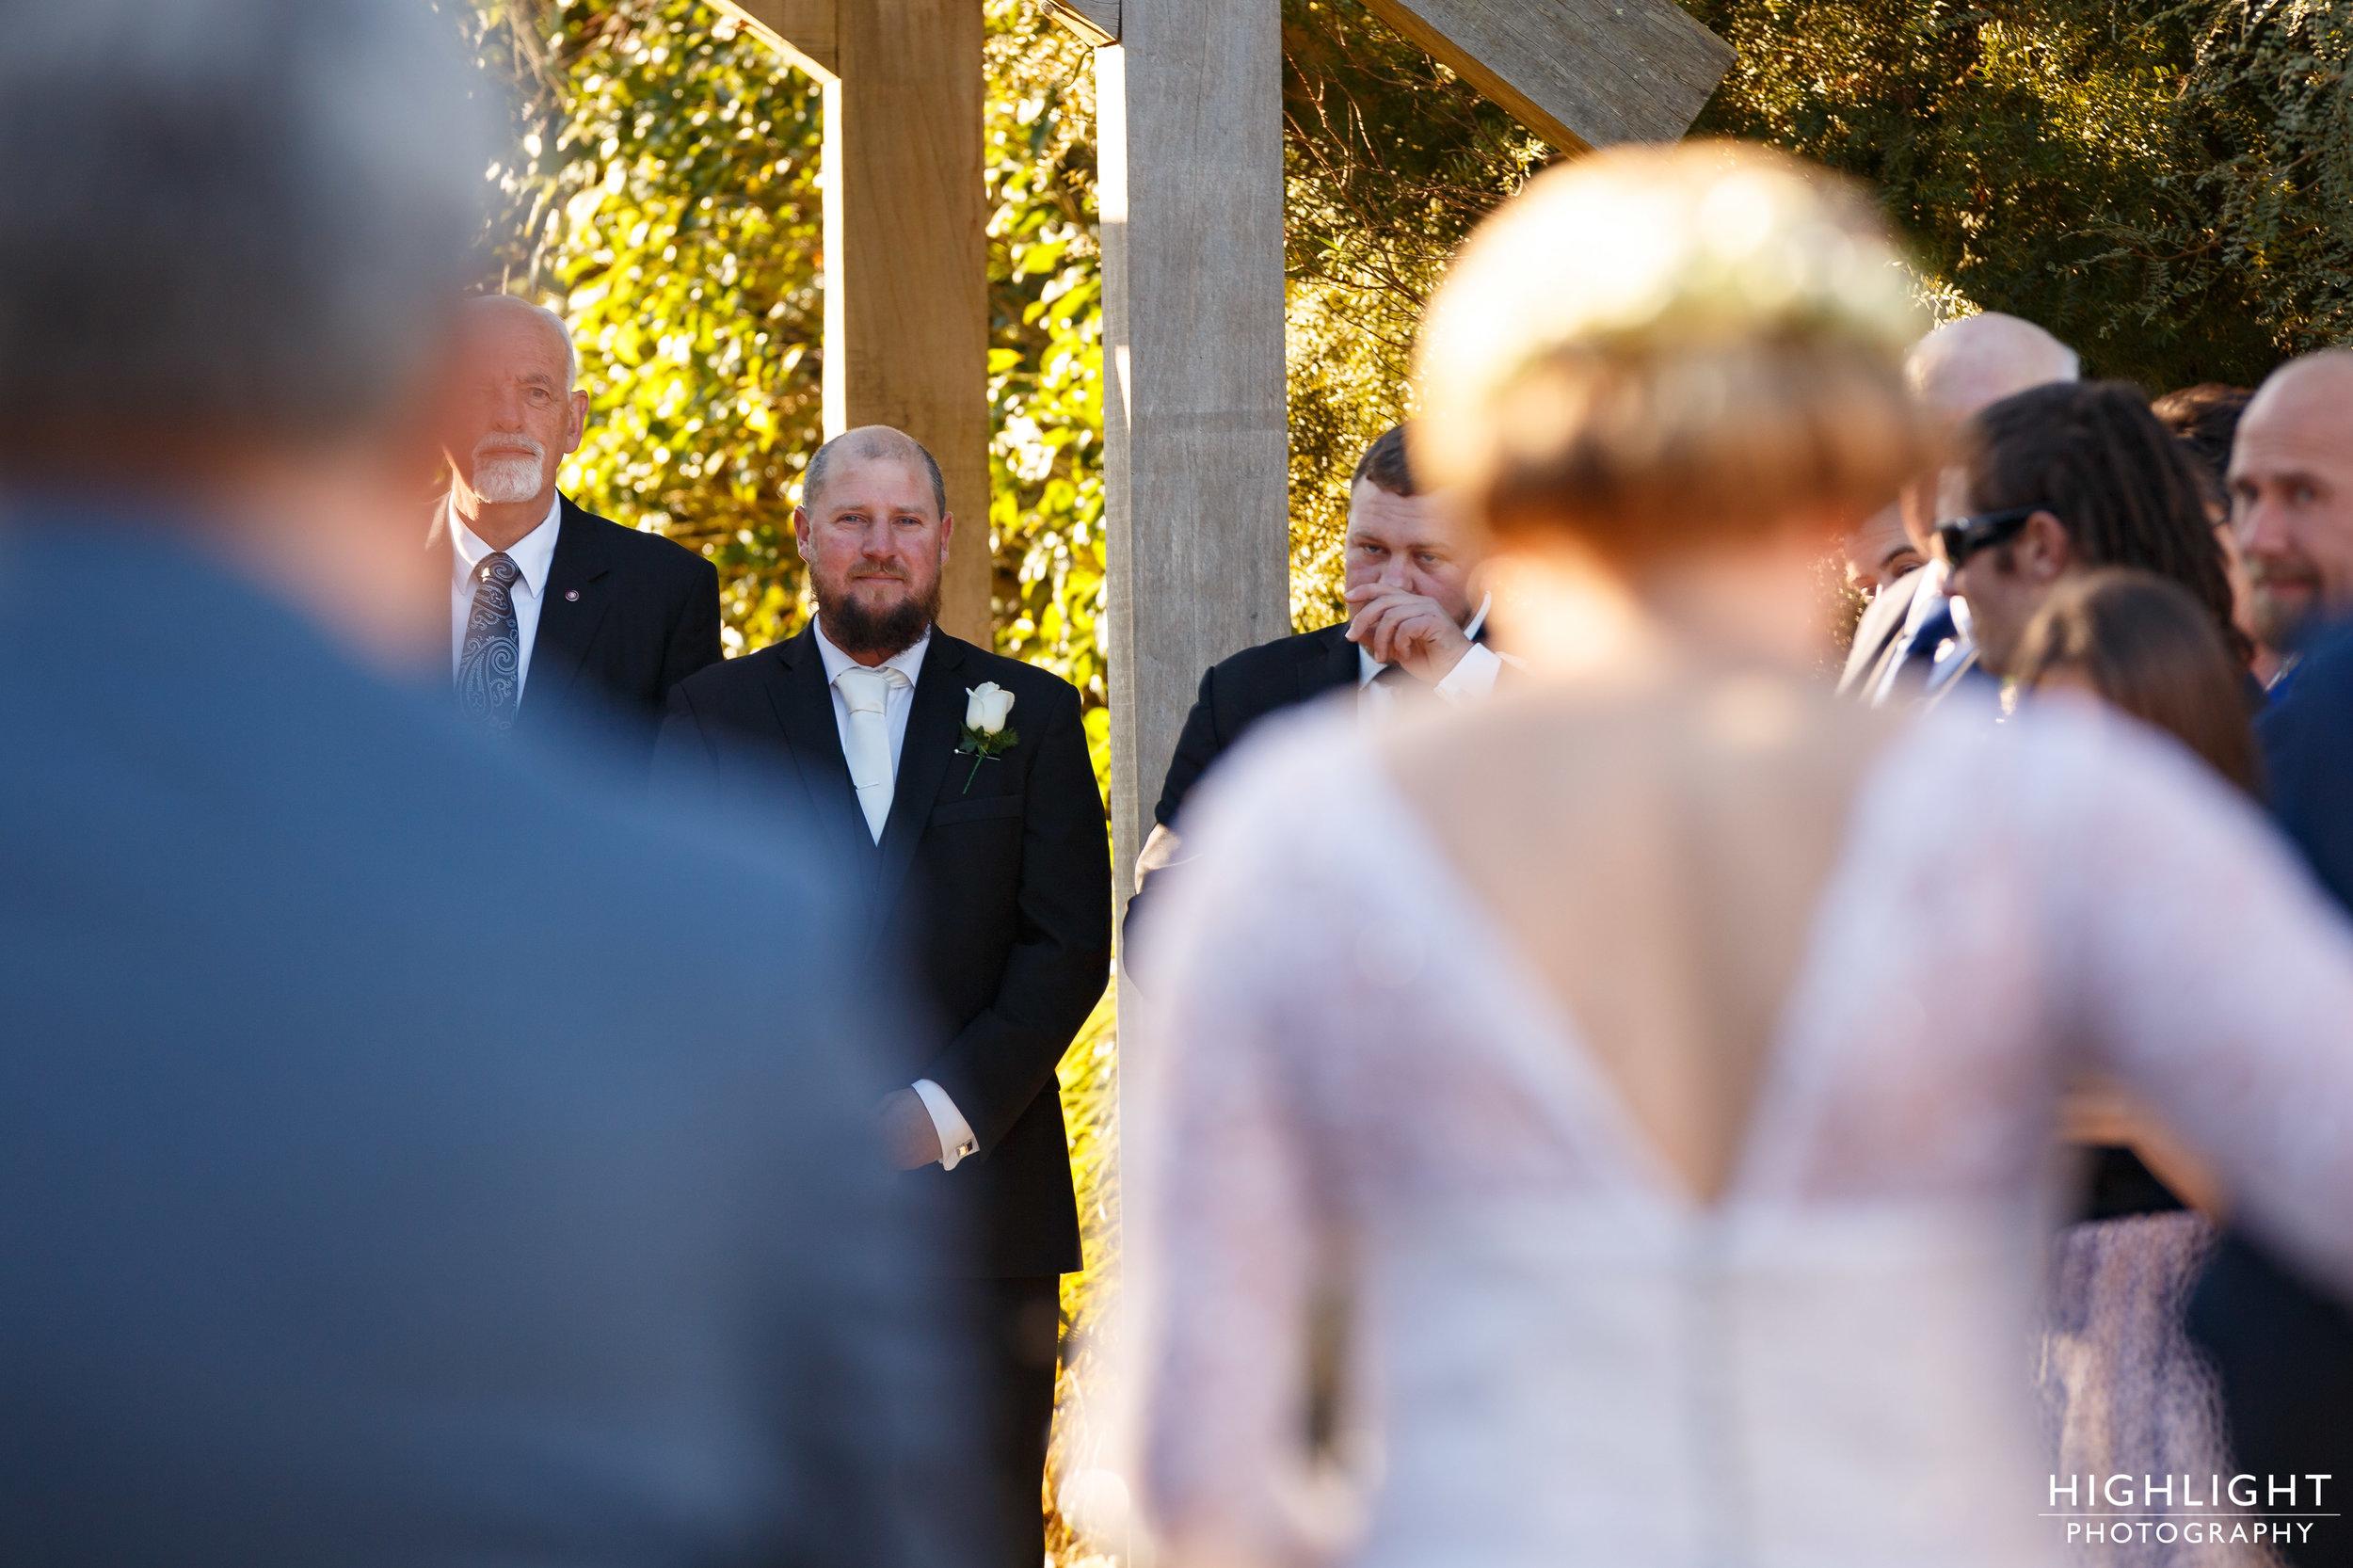 makoura-wedding-photography-highlight-new-zealand-28.jpg